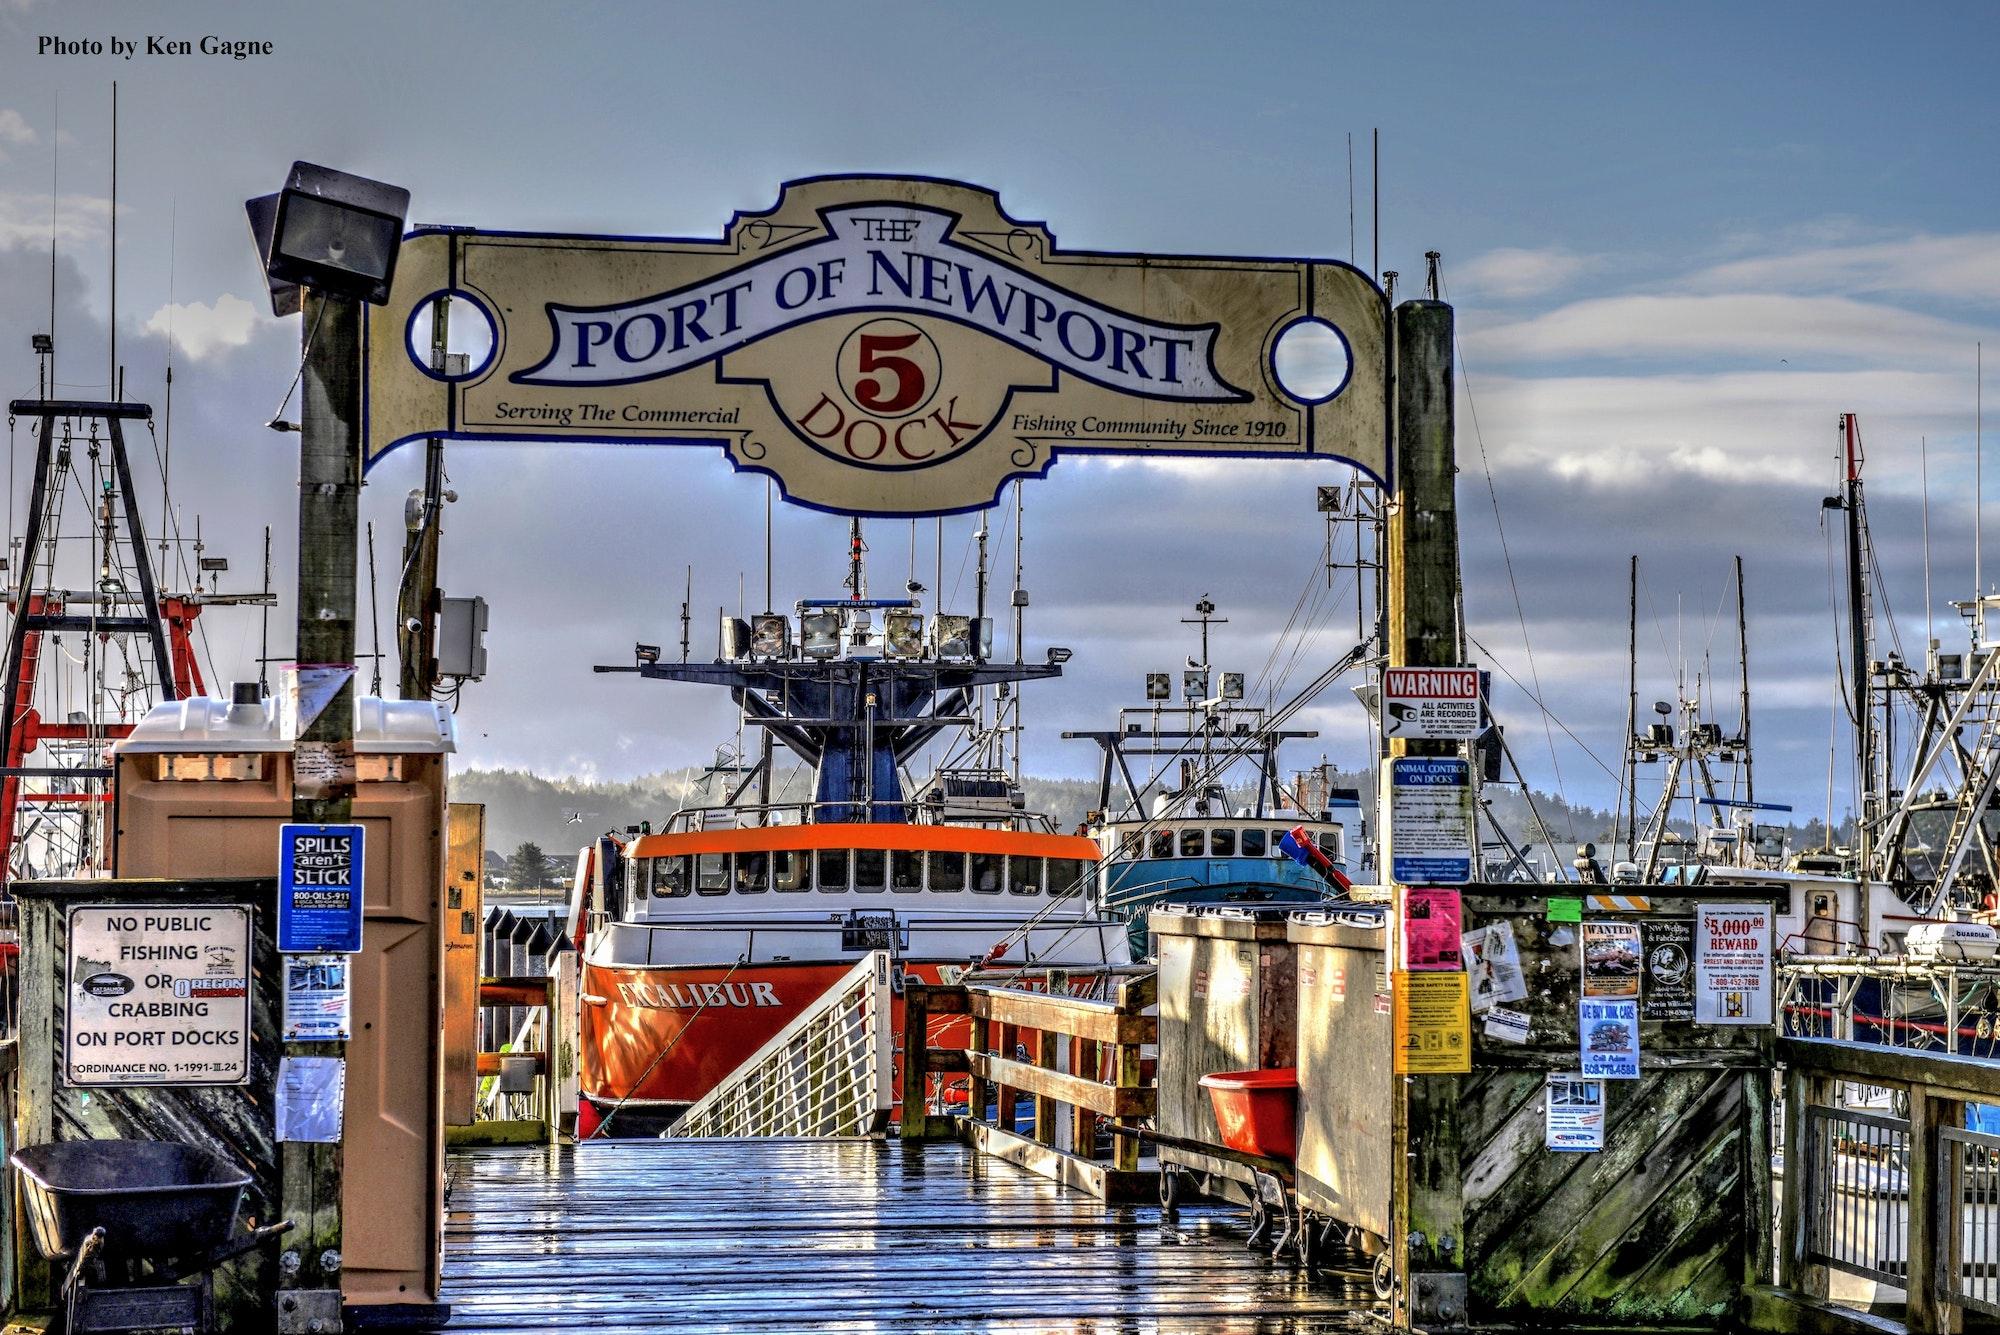 Port Dock 5 Pier sign.